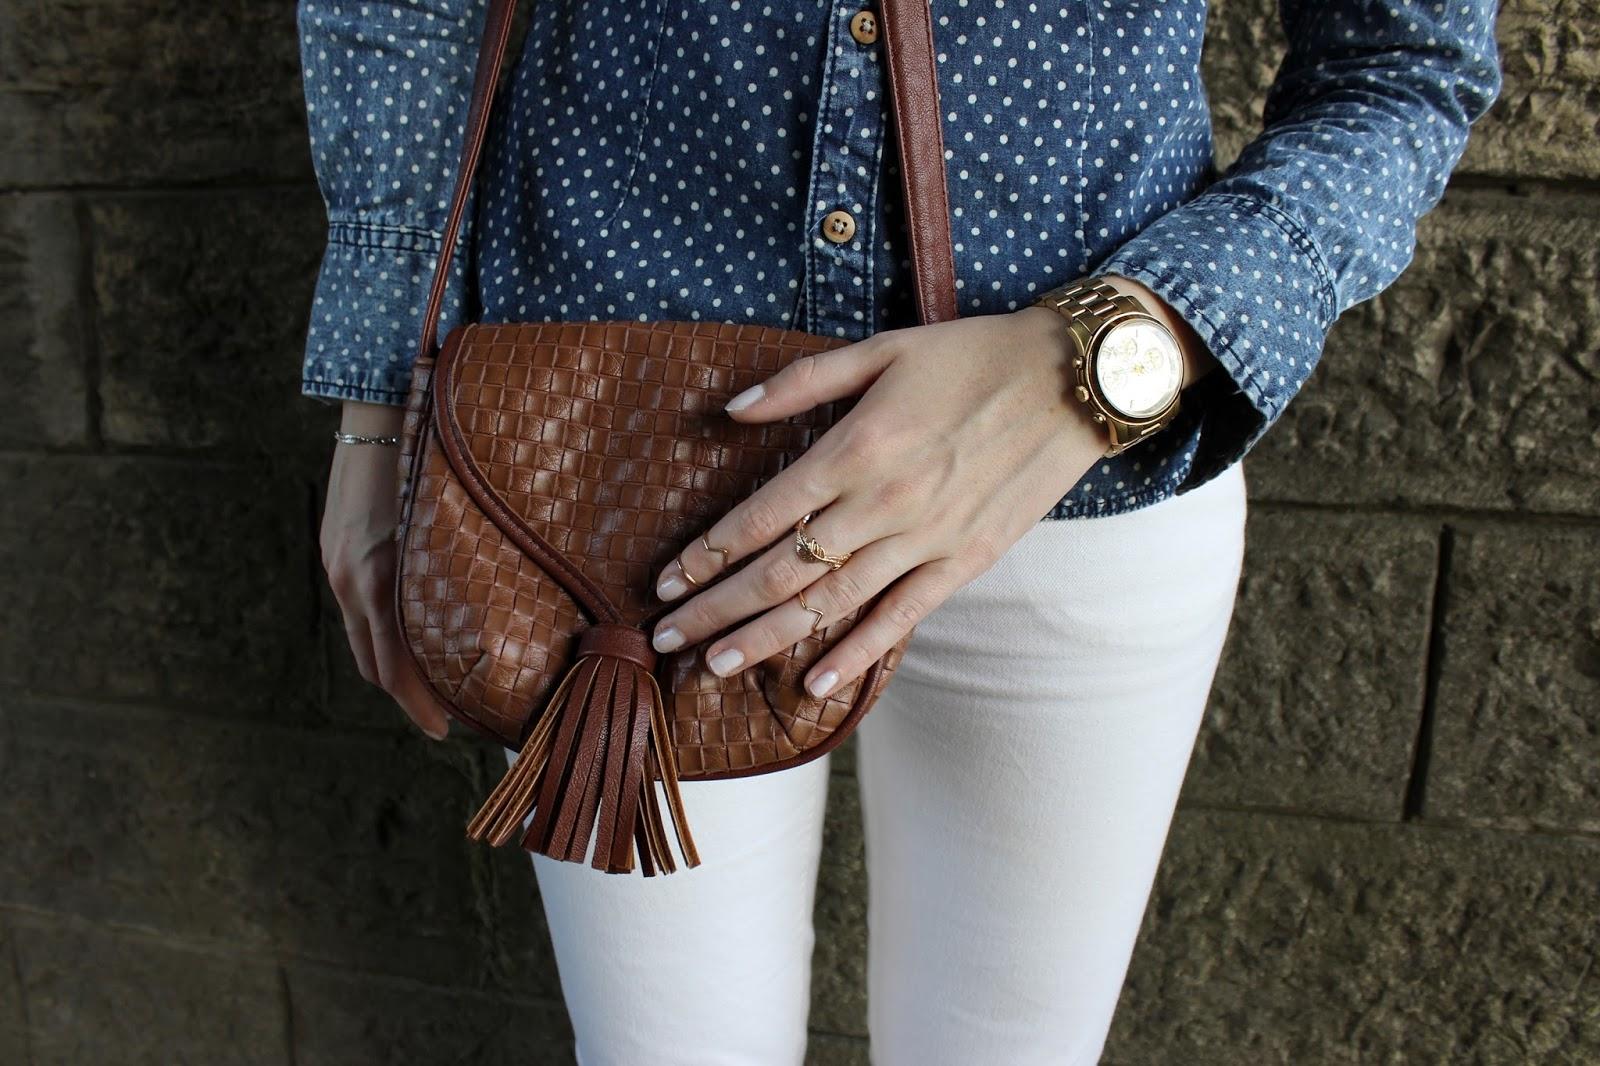 Jeansbluse Denim White Fringes Outfit Fashionblogger TheBlondeLion